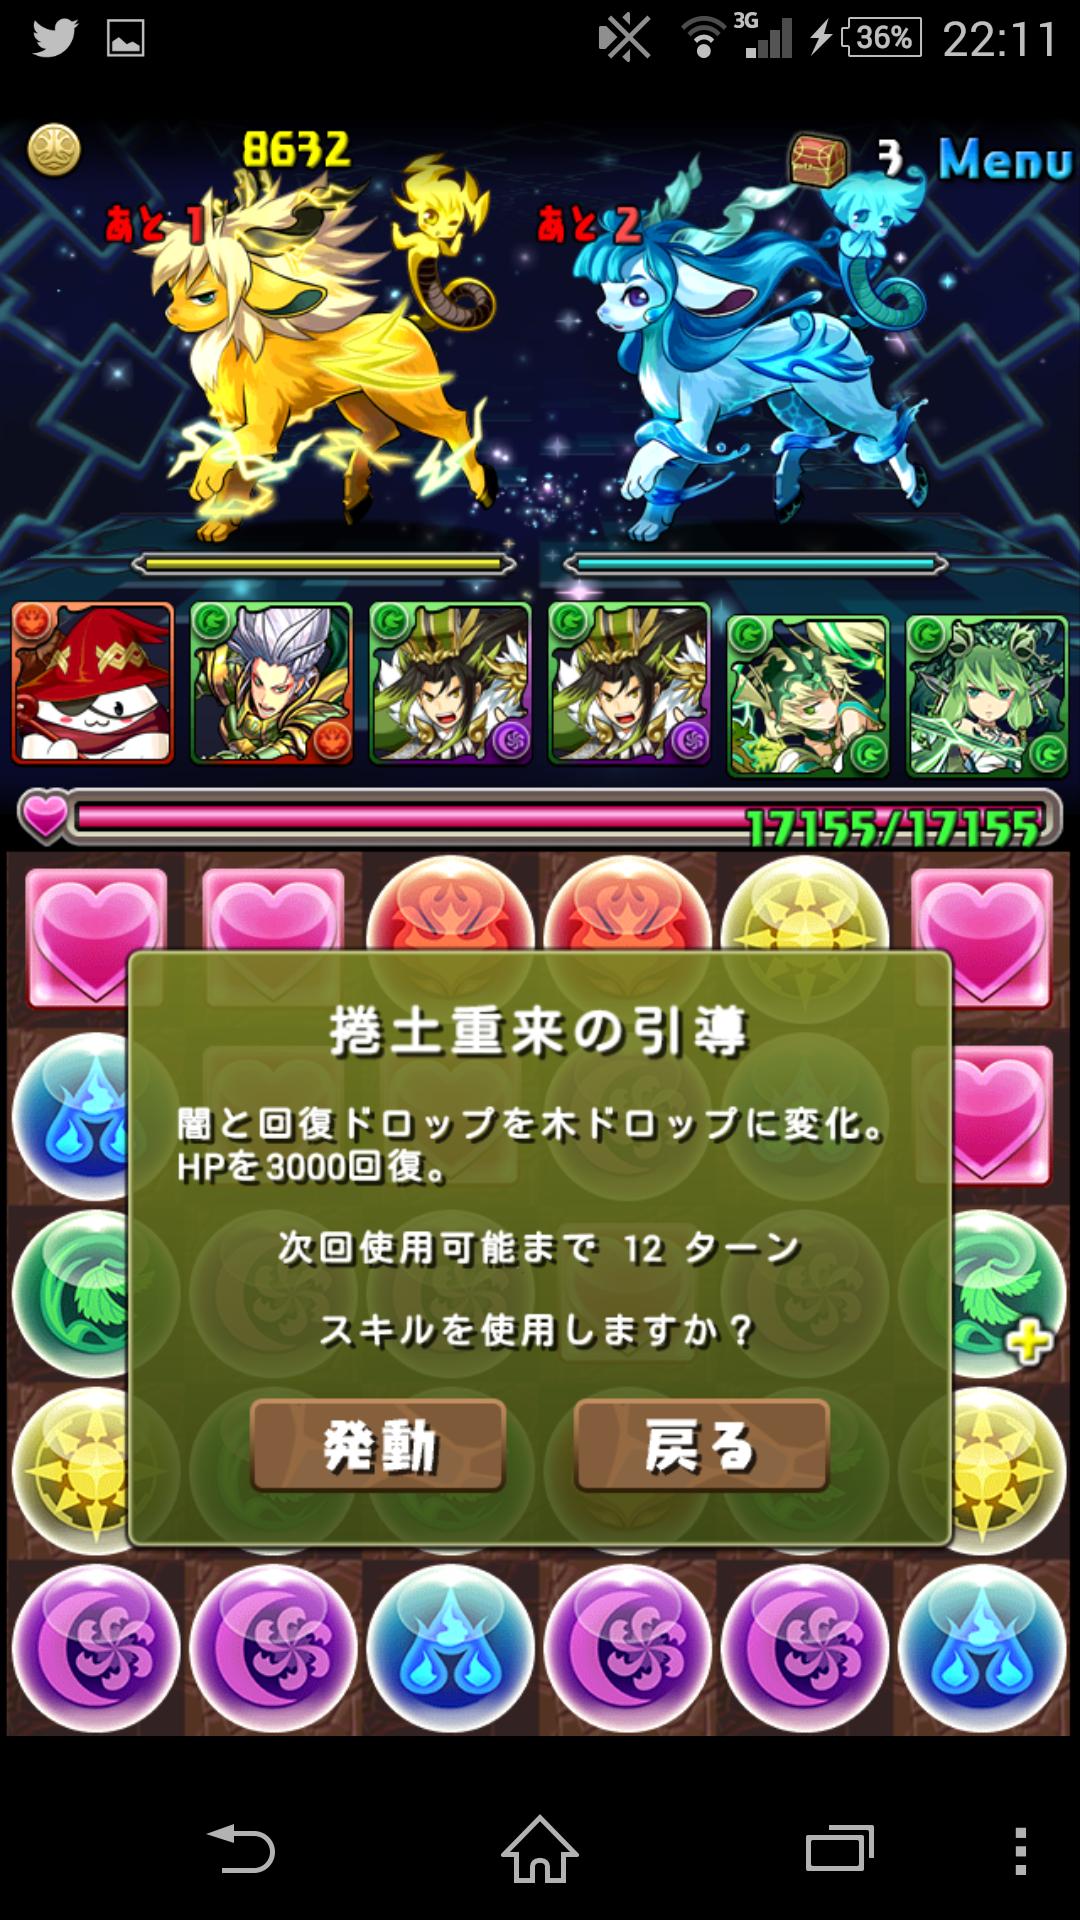 Screenshot_2015-02-20-22-11-36.png